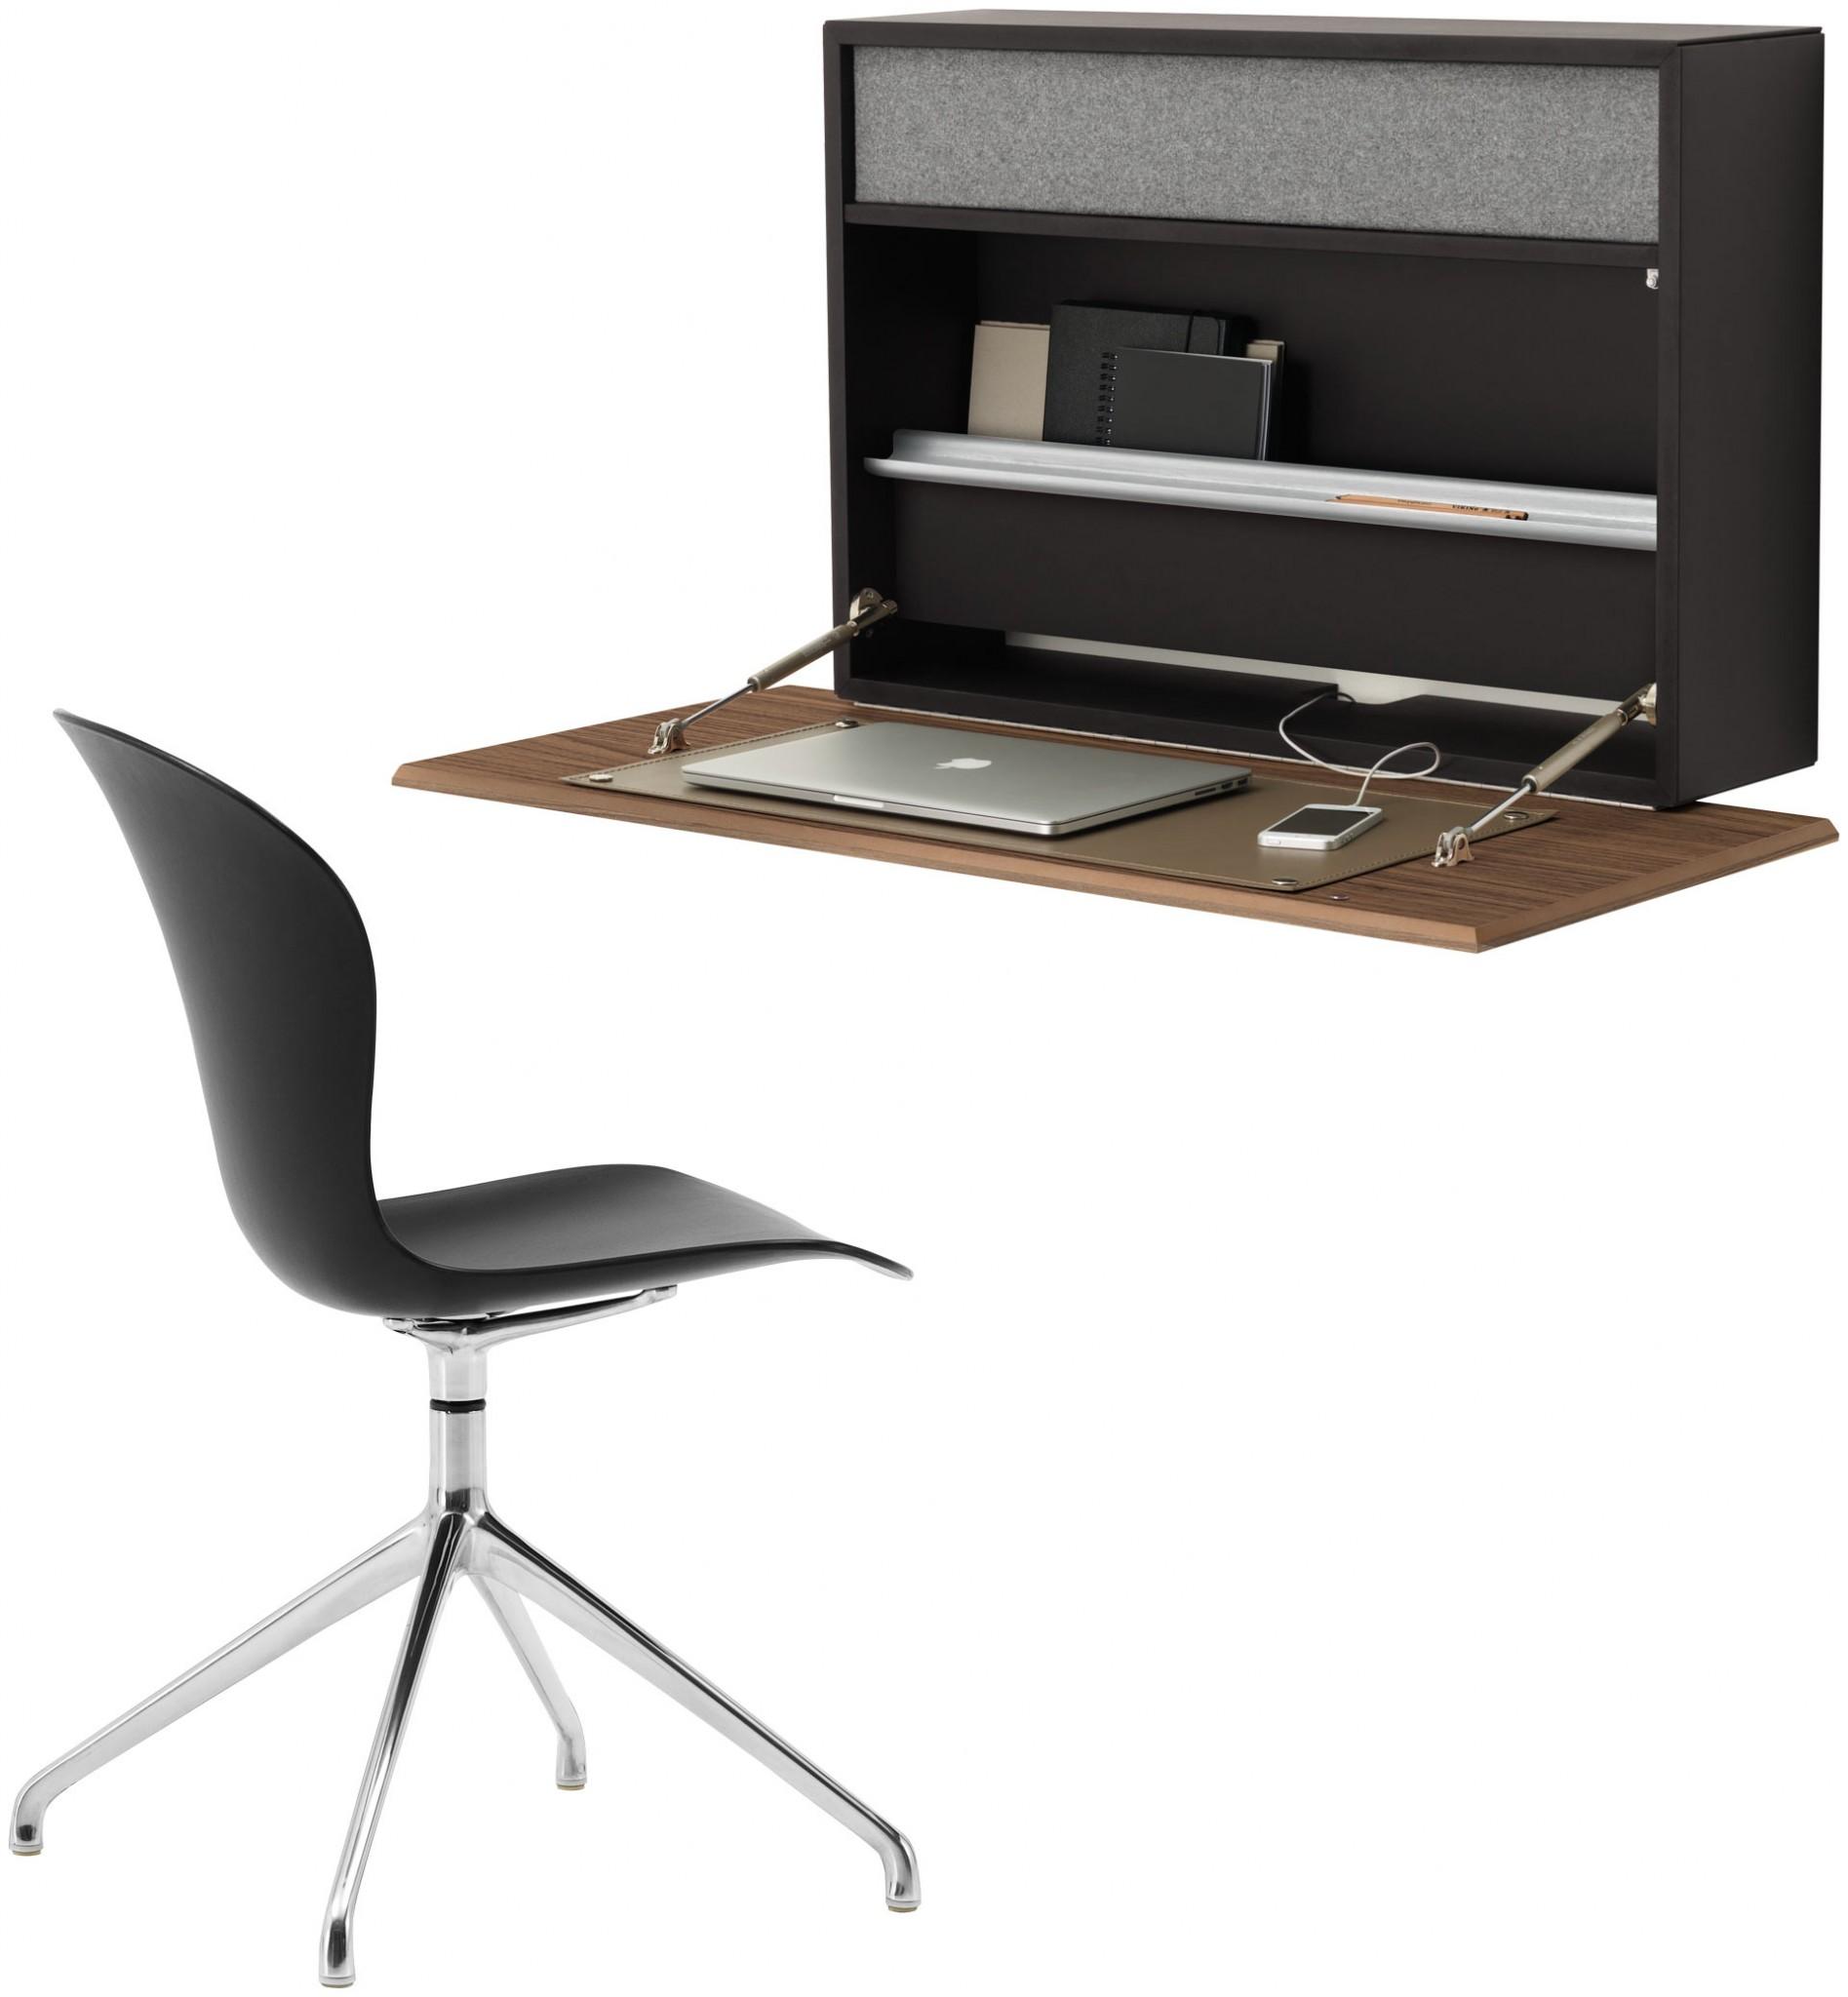 kontor-hjemmekontor-arbejdsplads-skrivebord-vaeghaengt